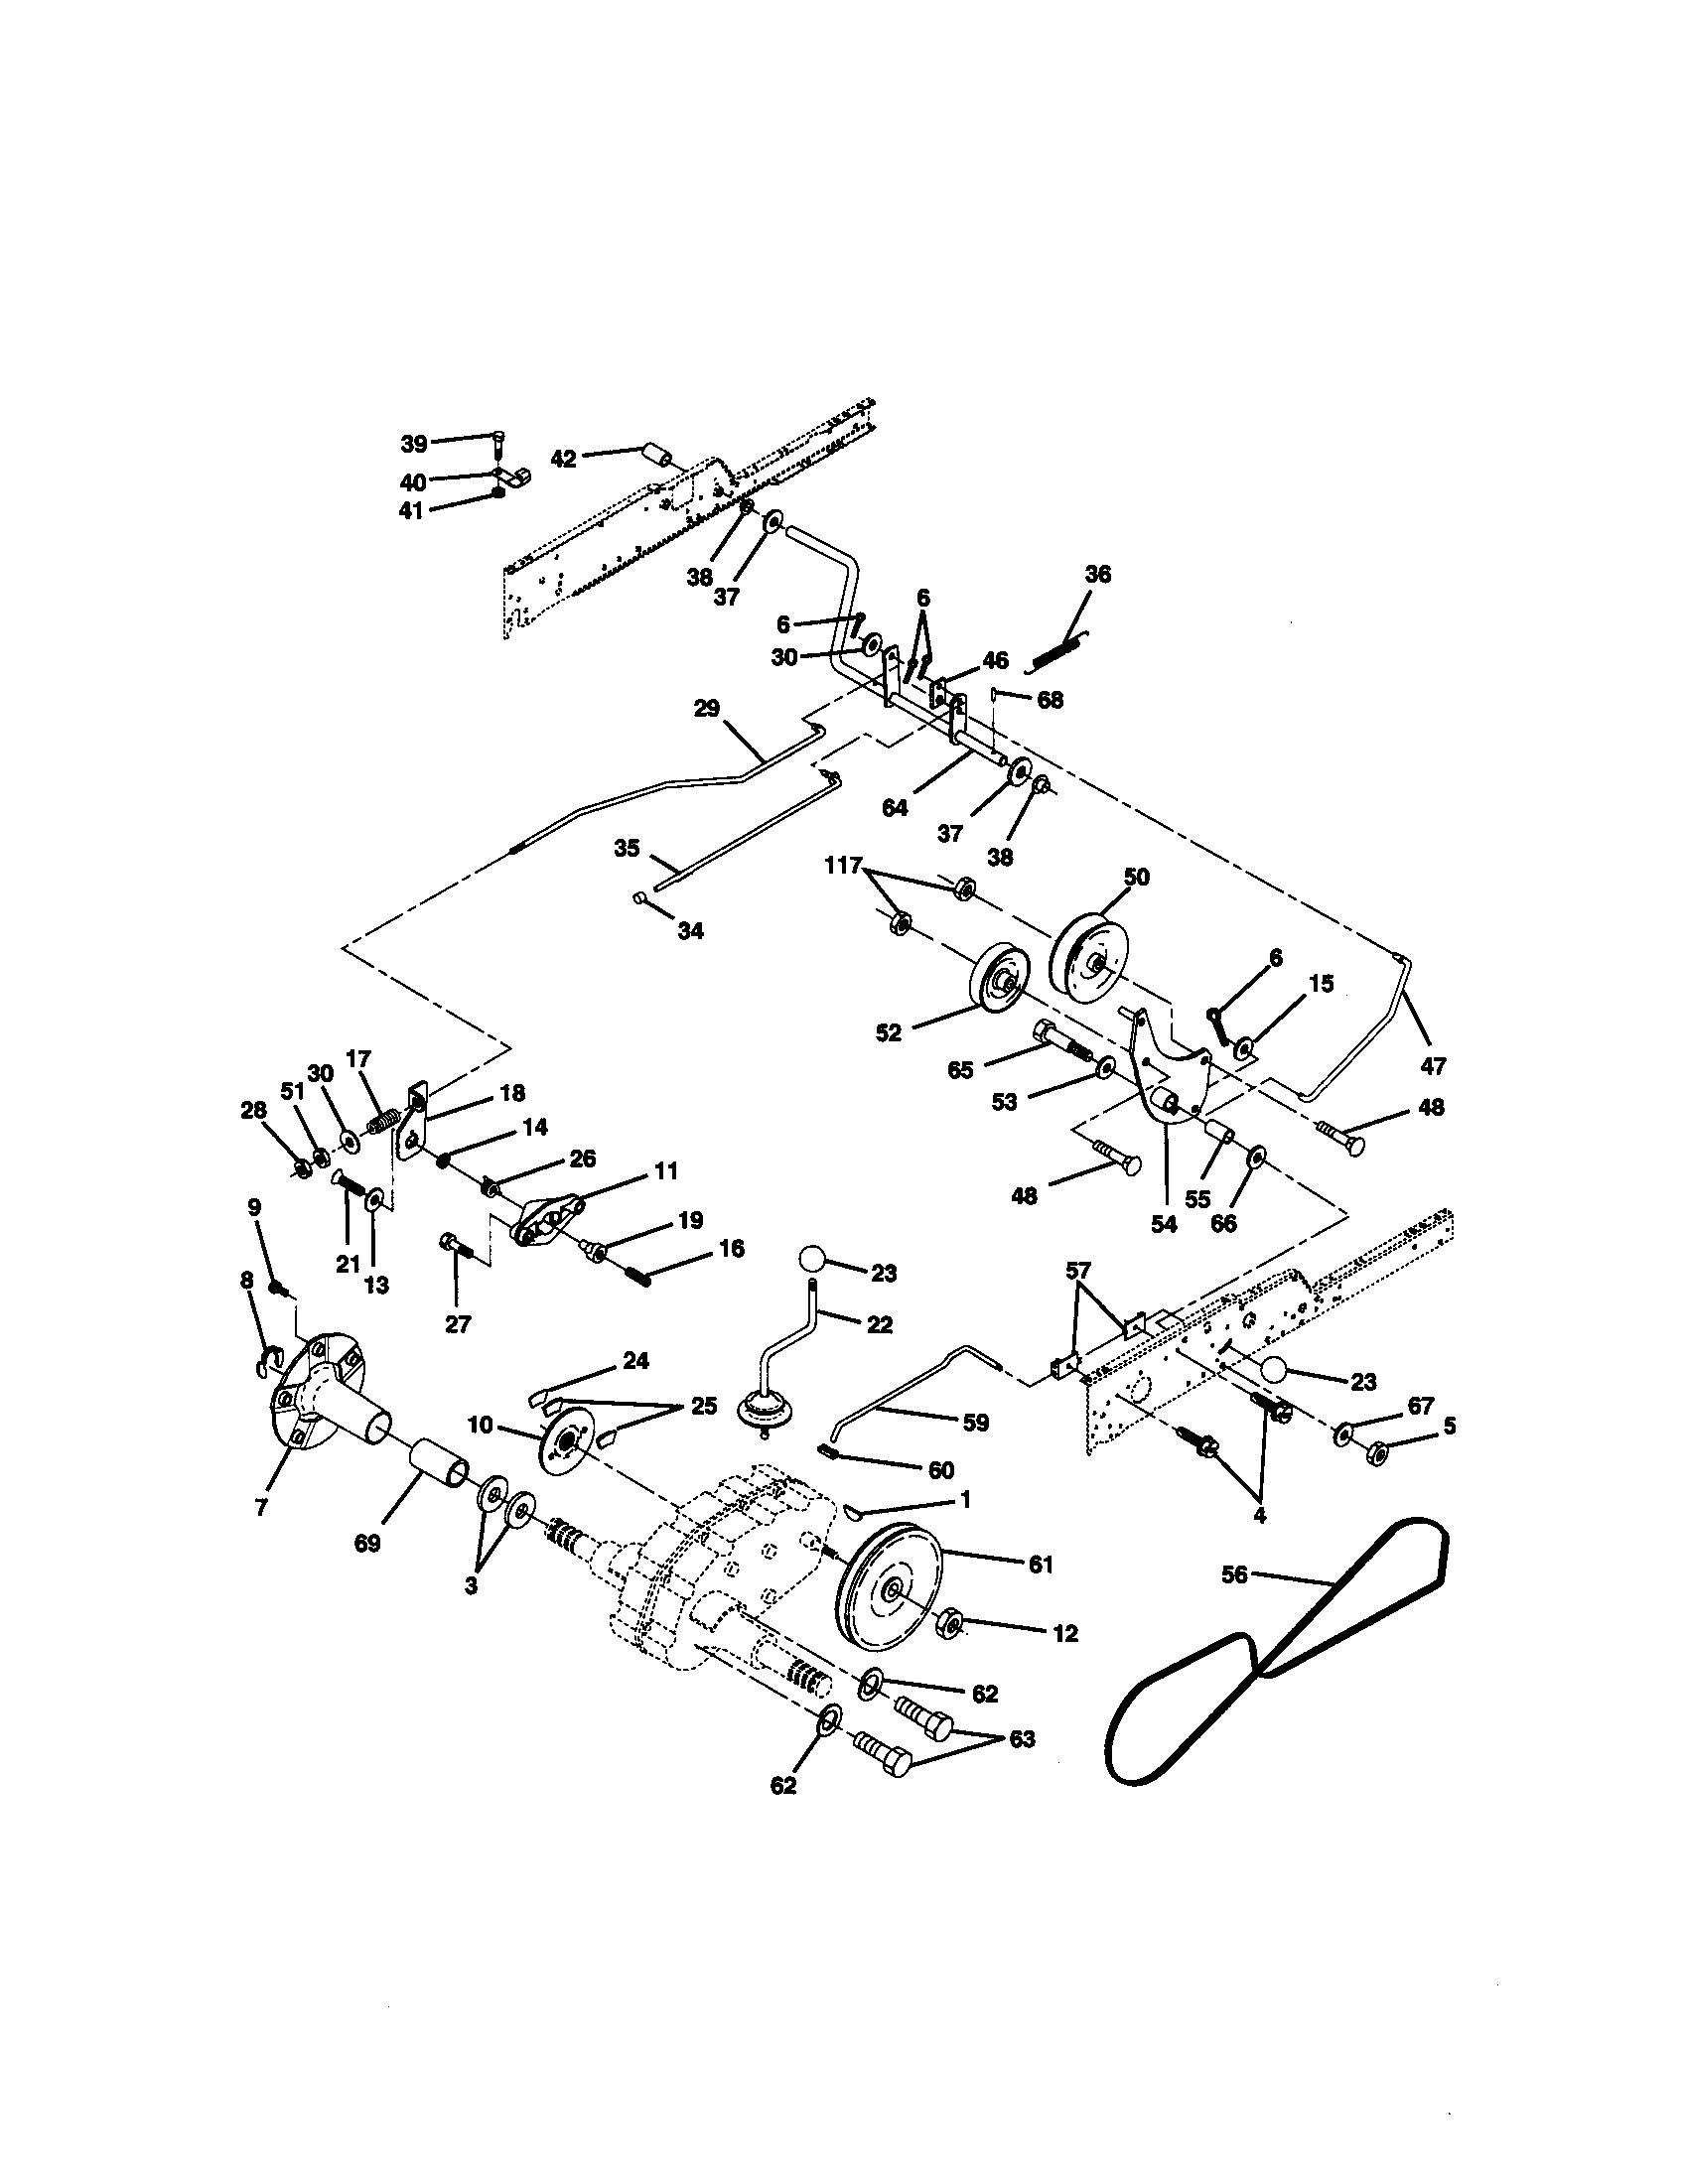 hight resolution of craftsman 917272950 ground drive diagram